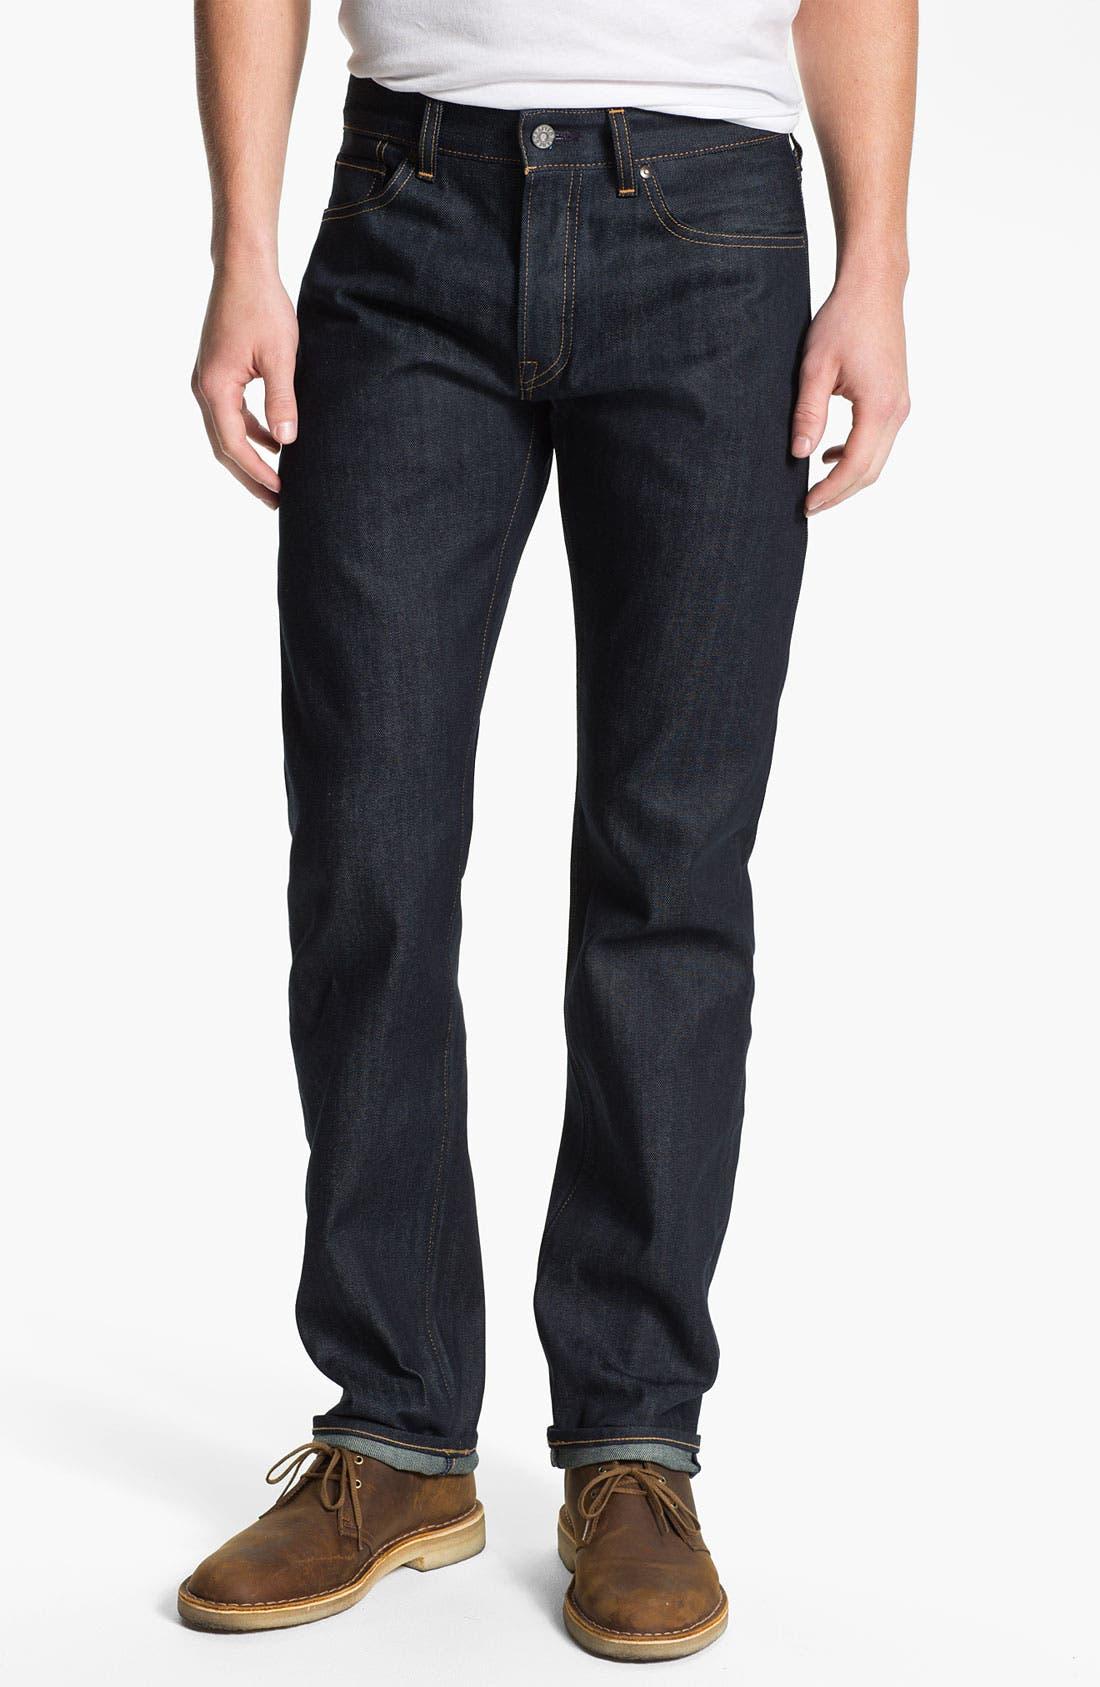 Alternate Image 1 Selected - Levi's® Made & Crafted™ 'Ruler' Straight Leg Jeans (Indigo Rigid)